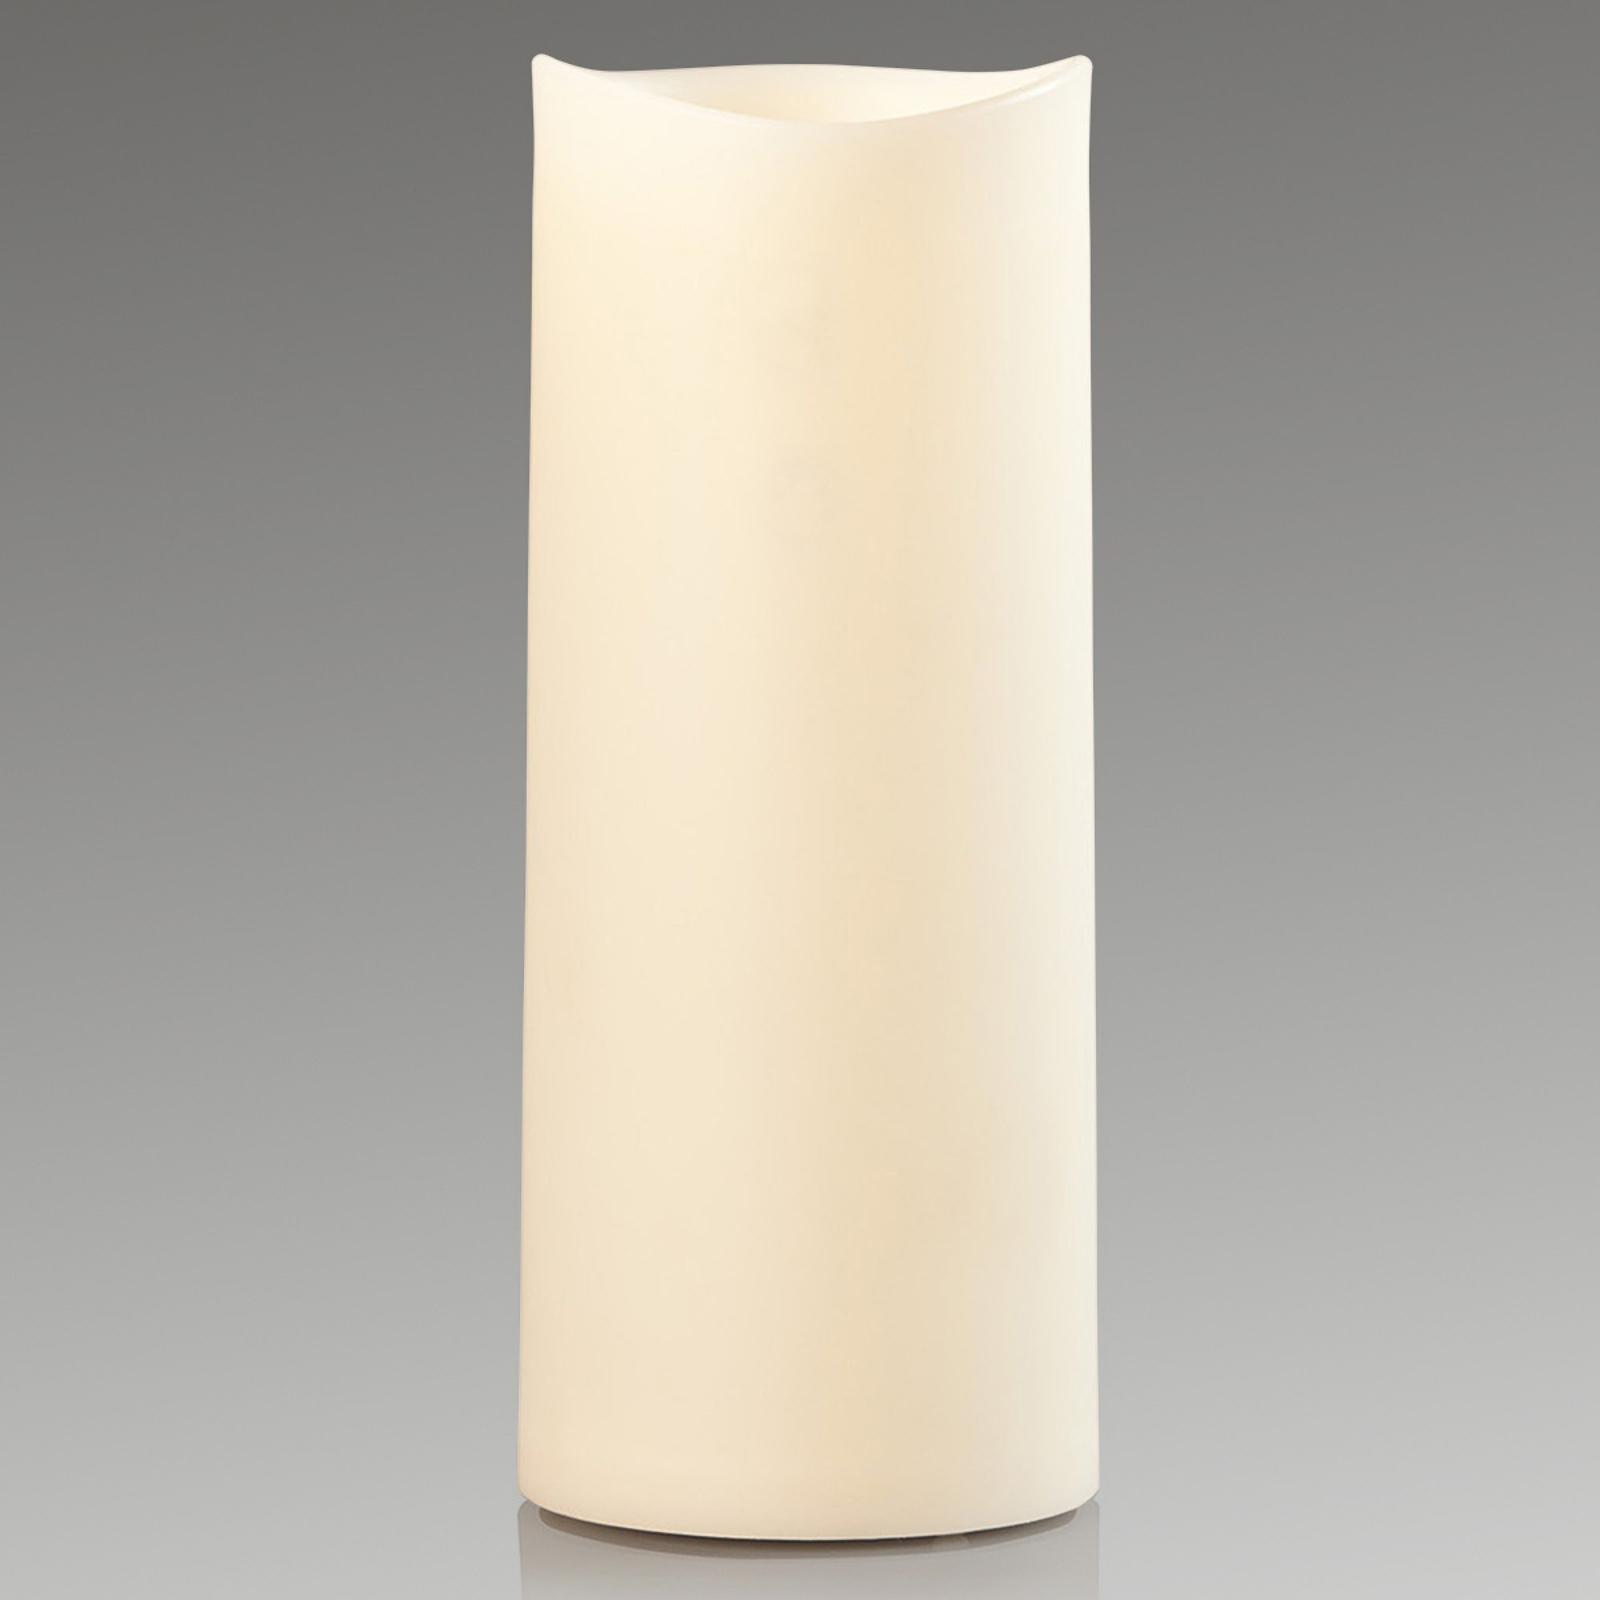 Luce decorativa LED Outdoor Candle 22 cm